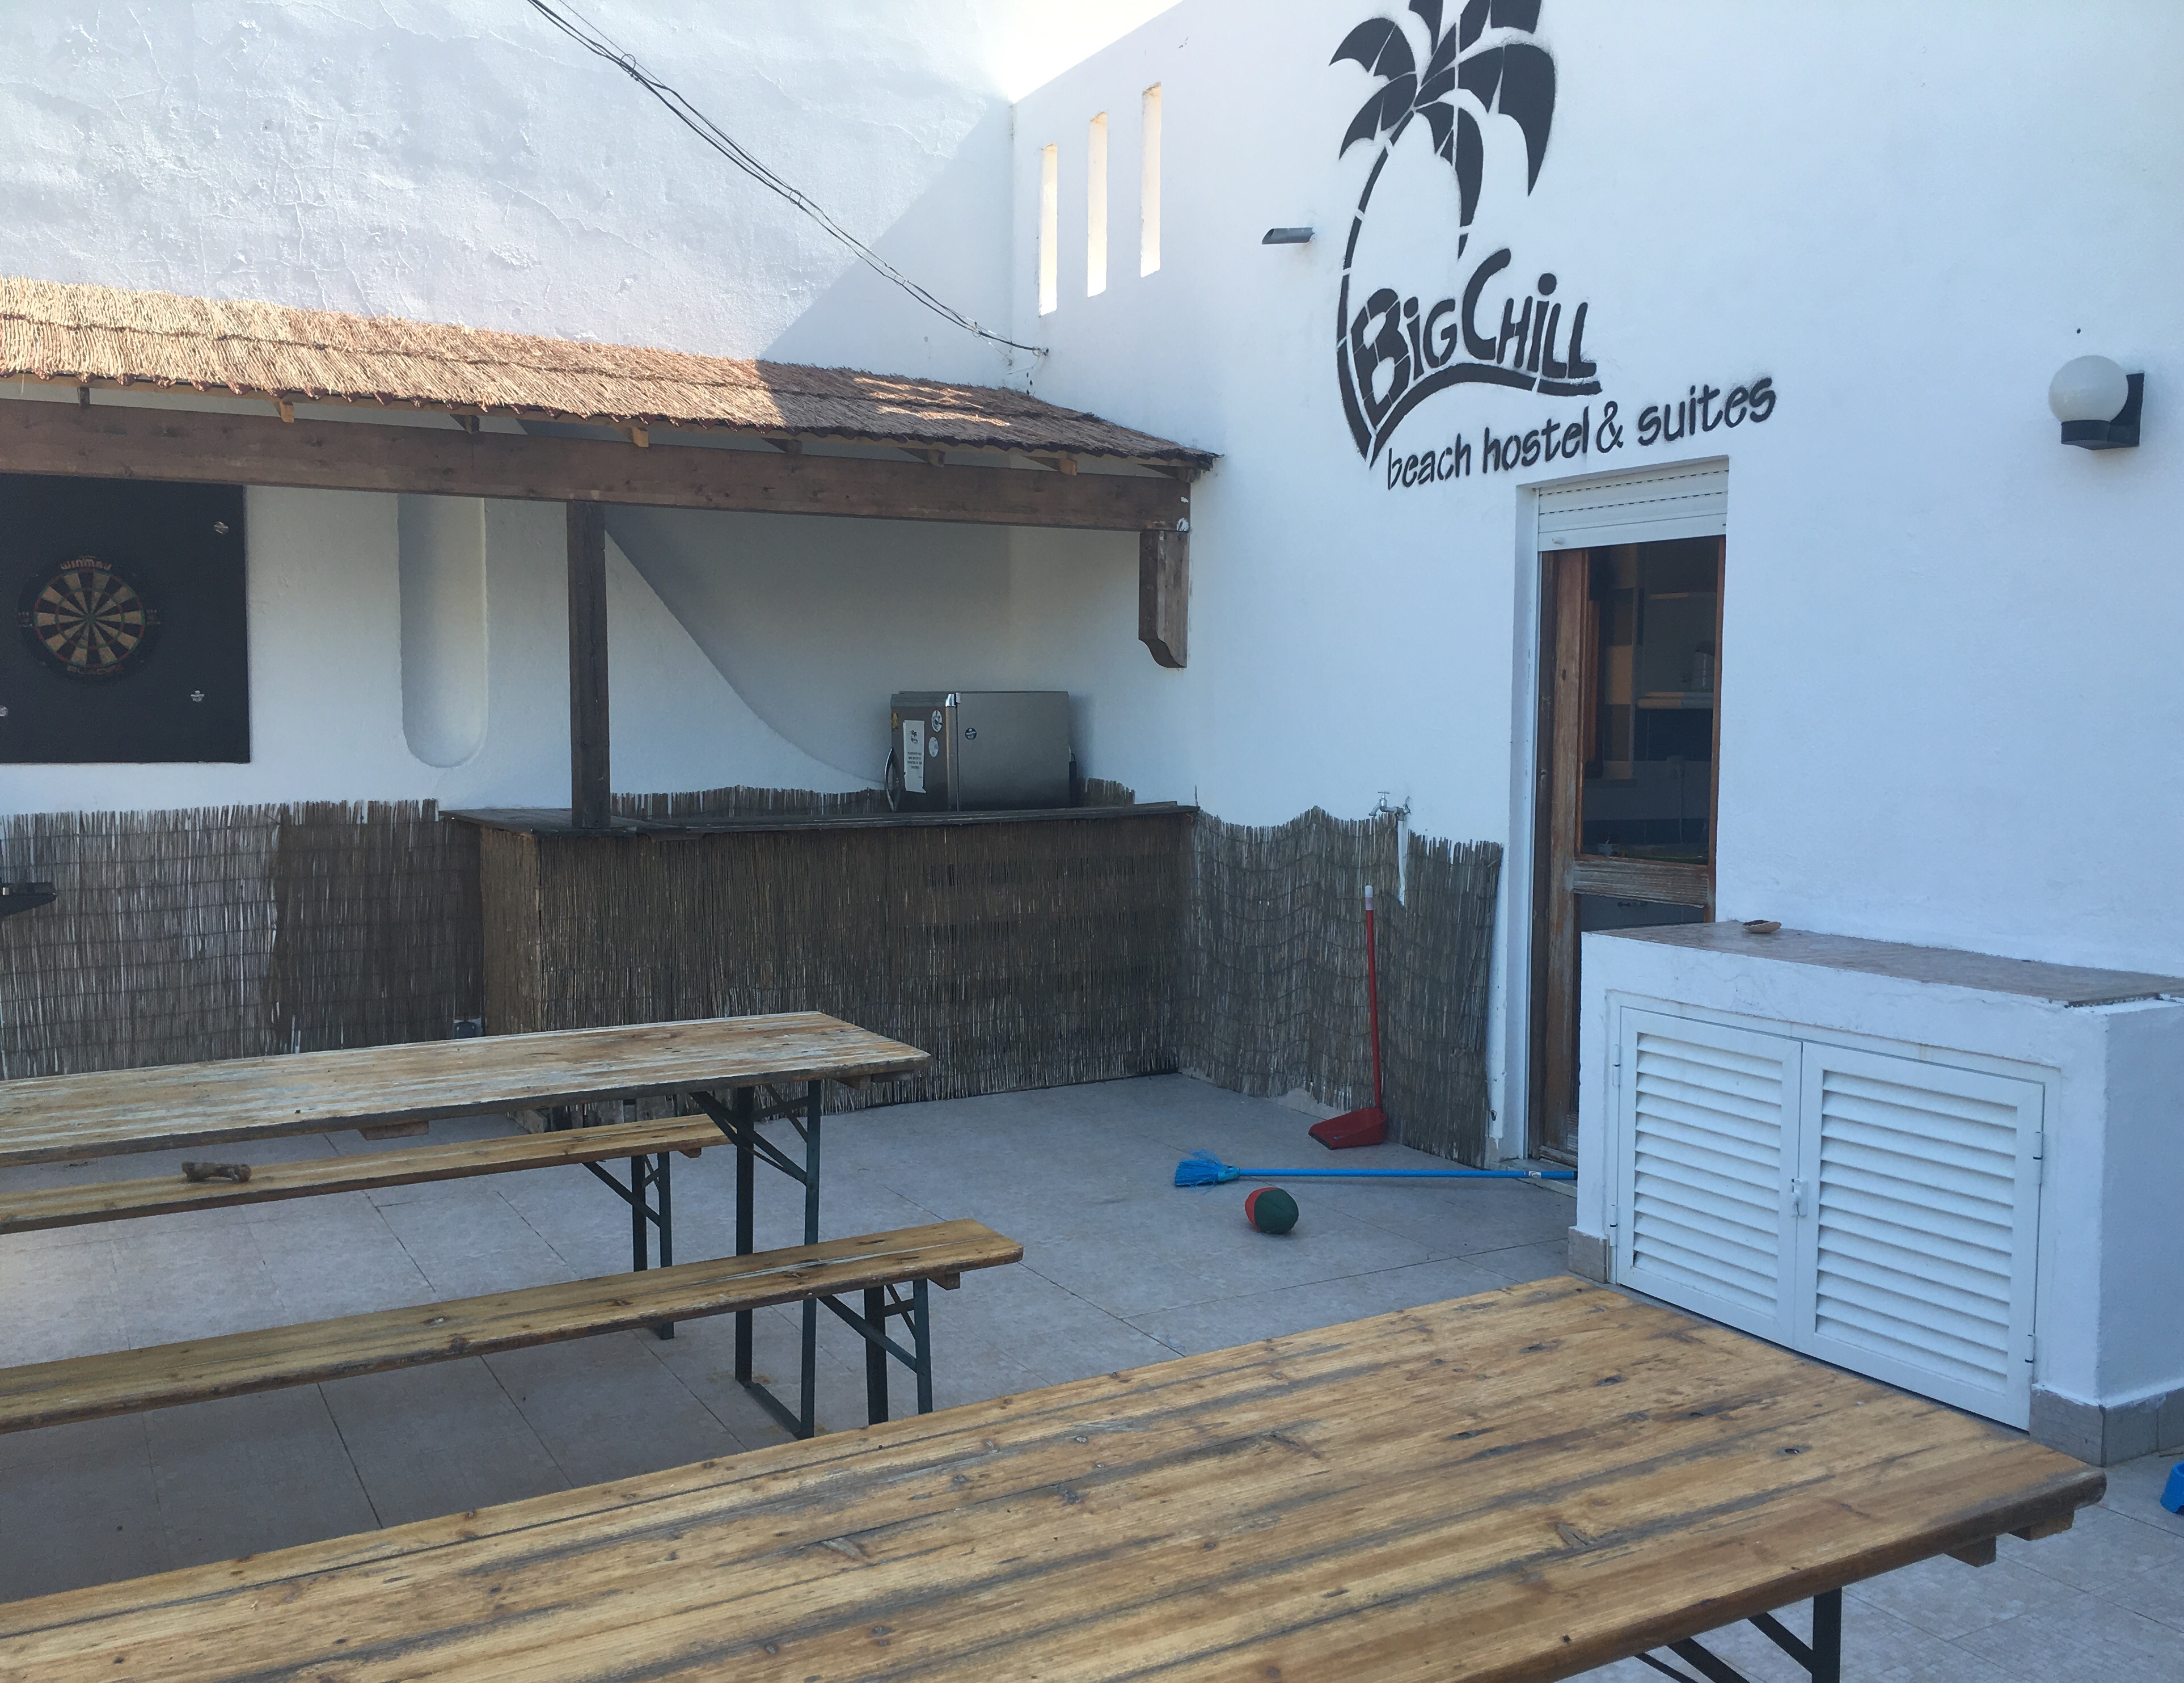 Patio area at The Big Chill Hostel in Lagos, Algarve, Potugal